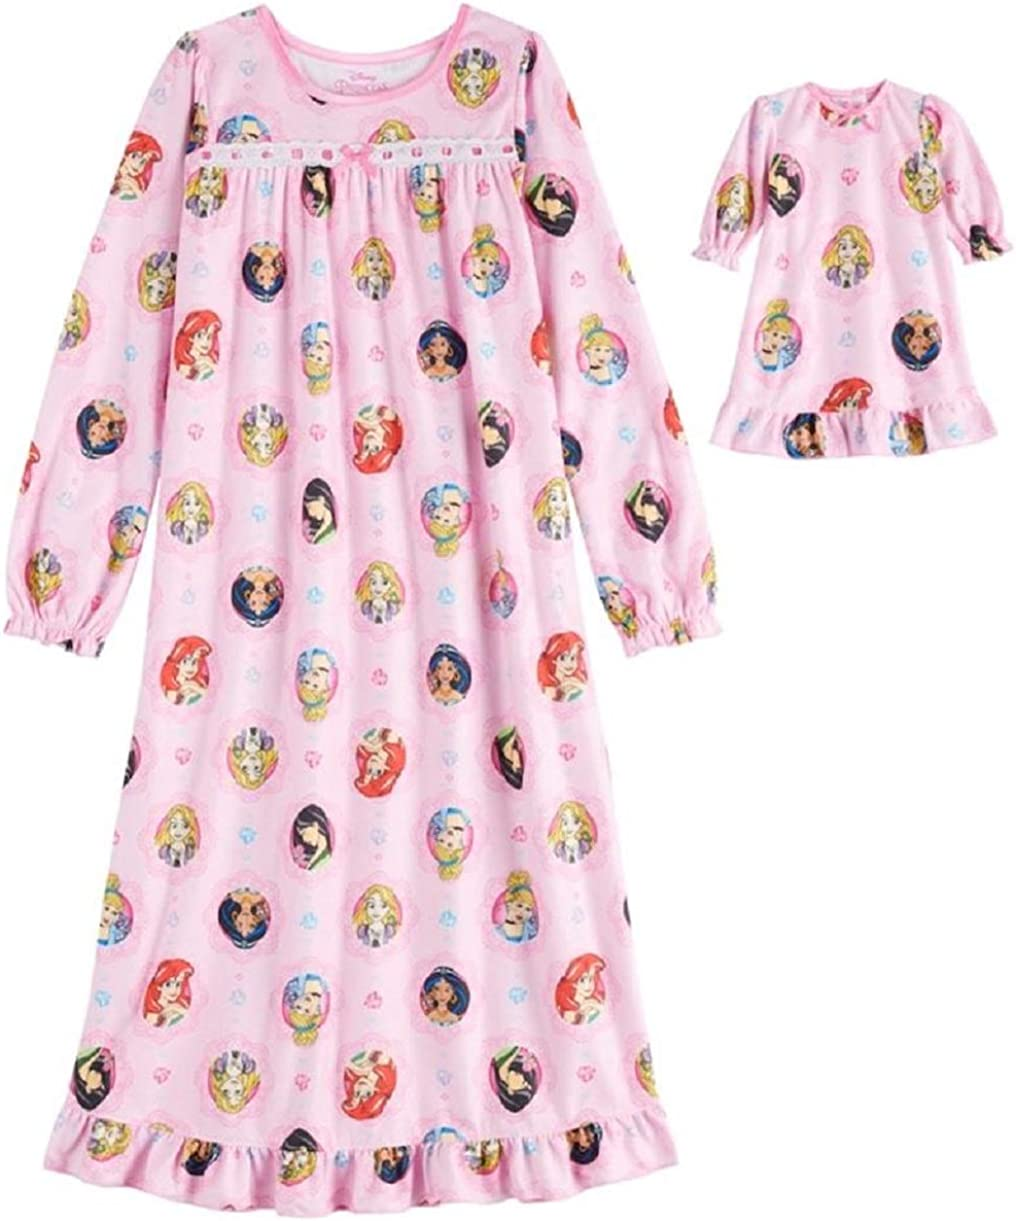 Jxstar Matching Doll /& Girls Nightgowns Pajamas Princess Night Shirts Sleepwear